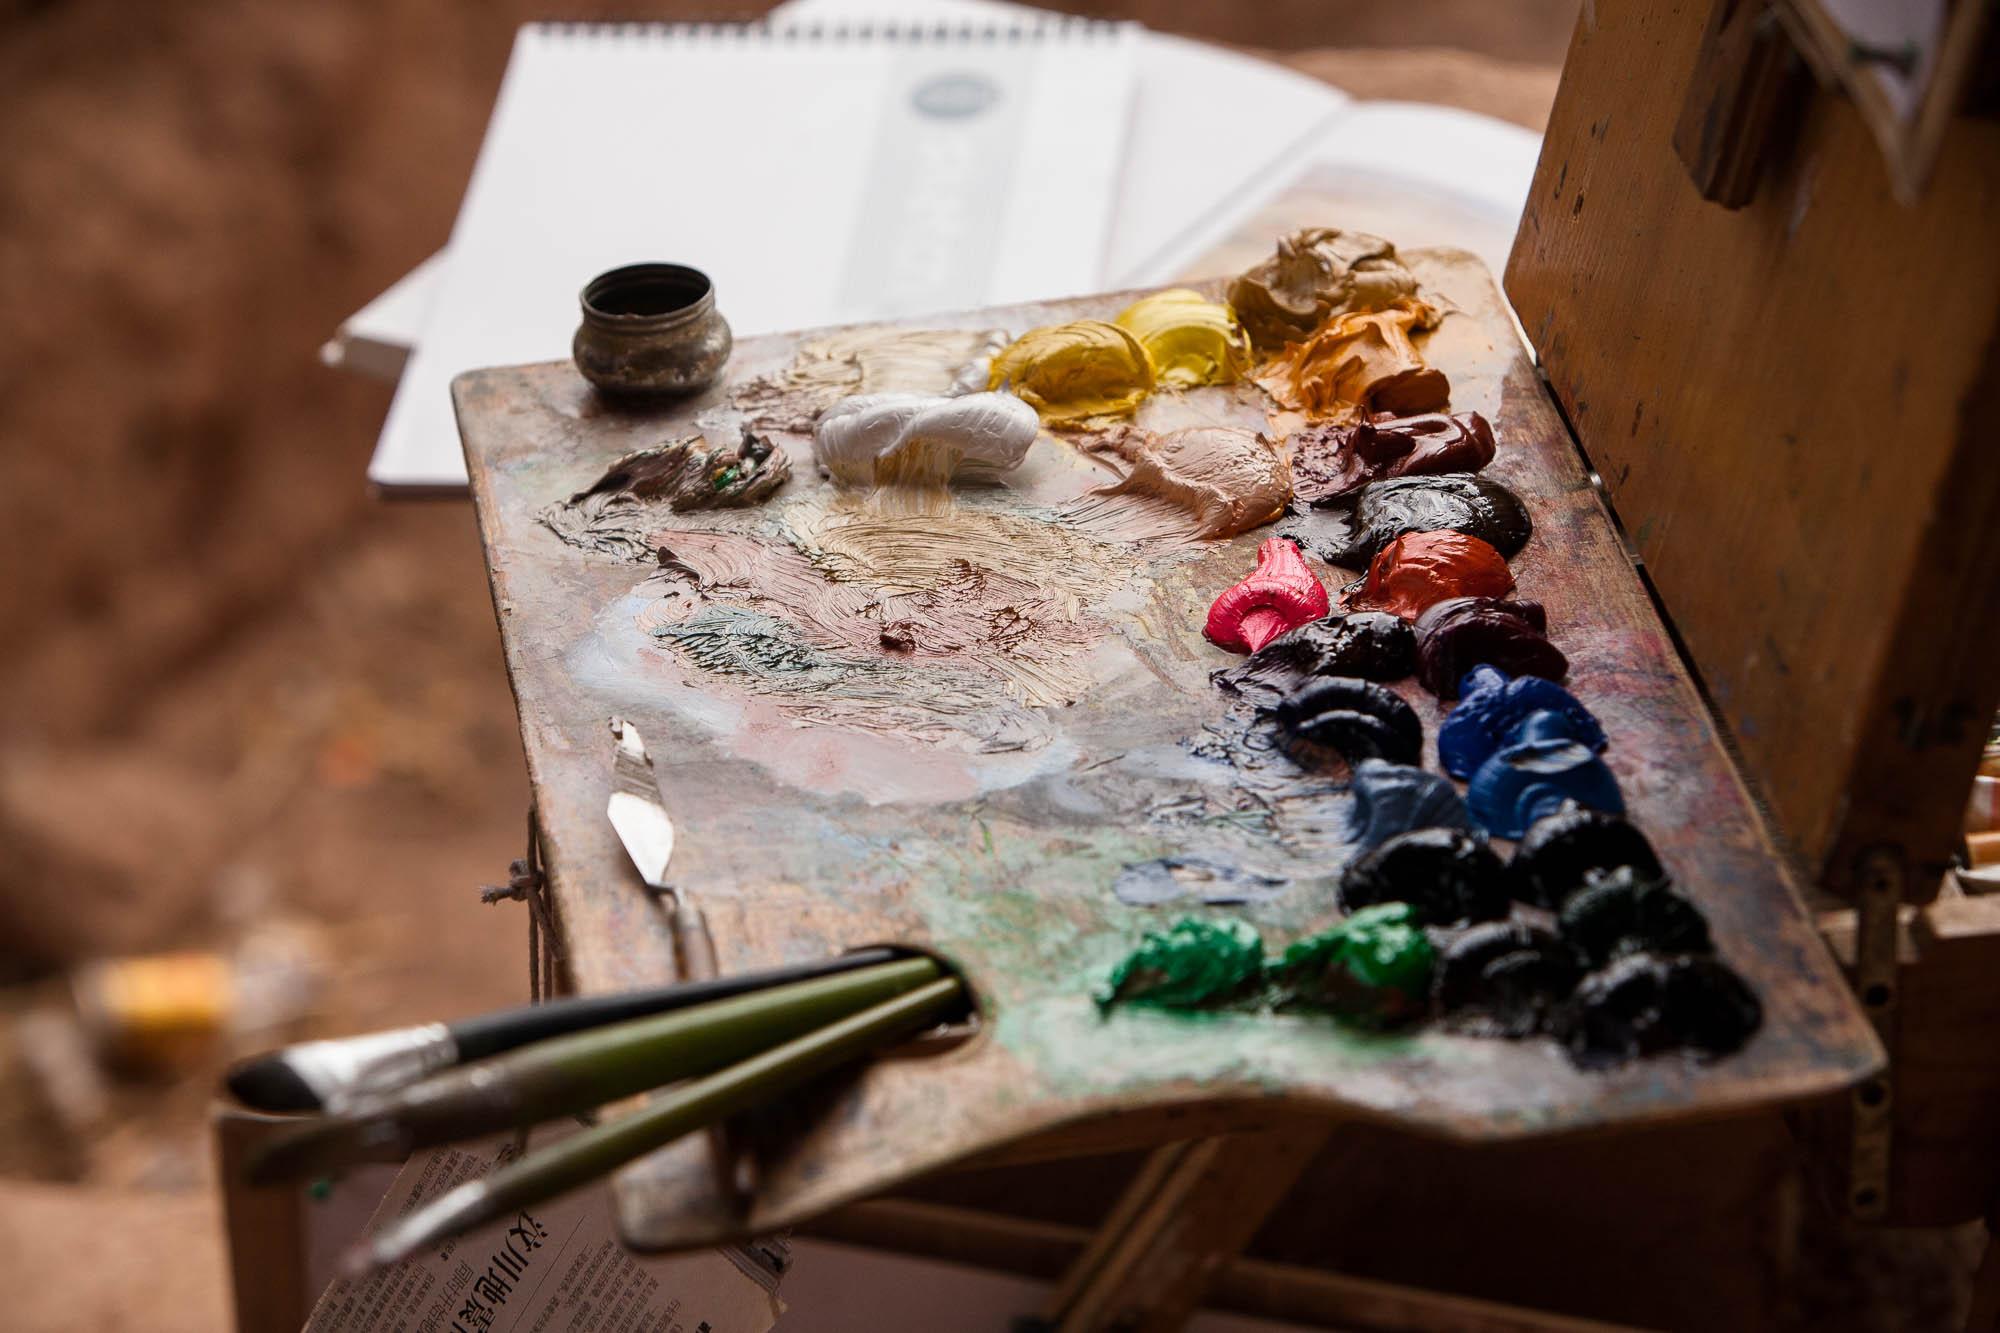 the artist's stuff